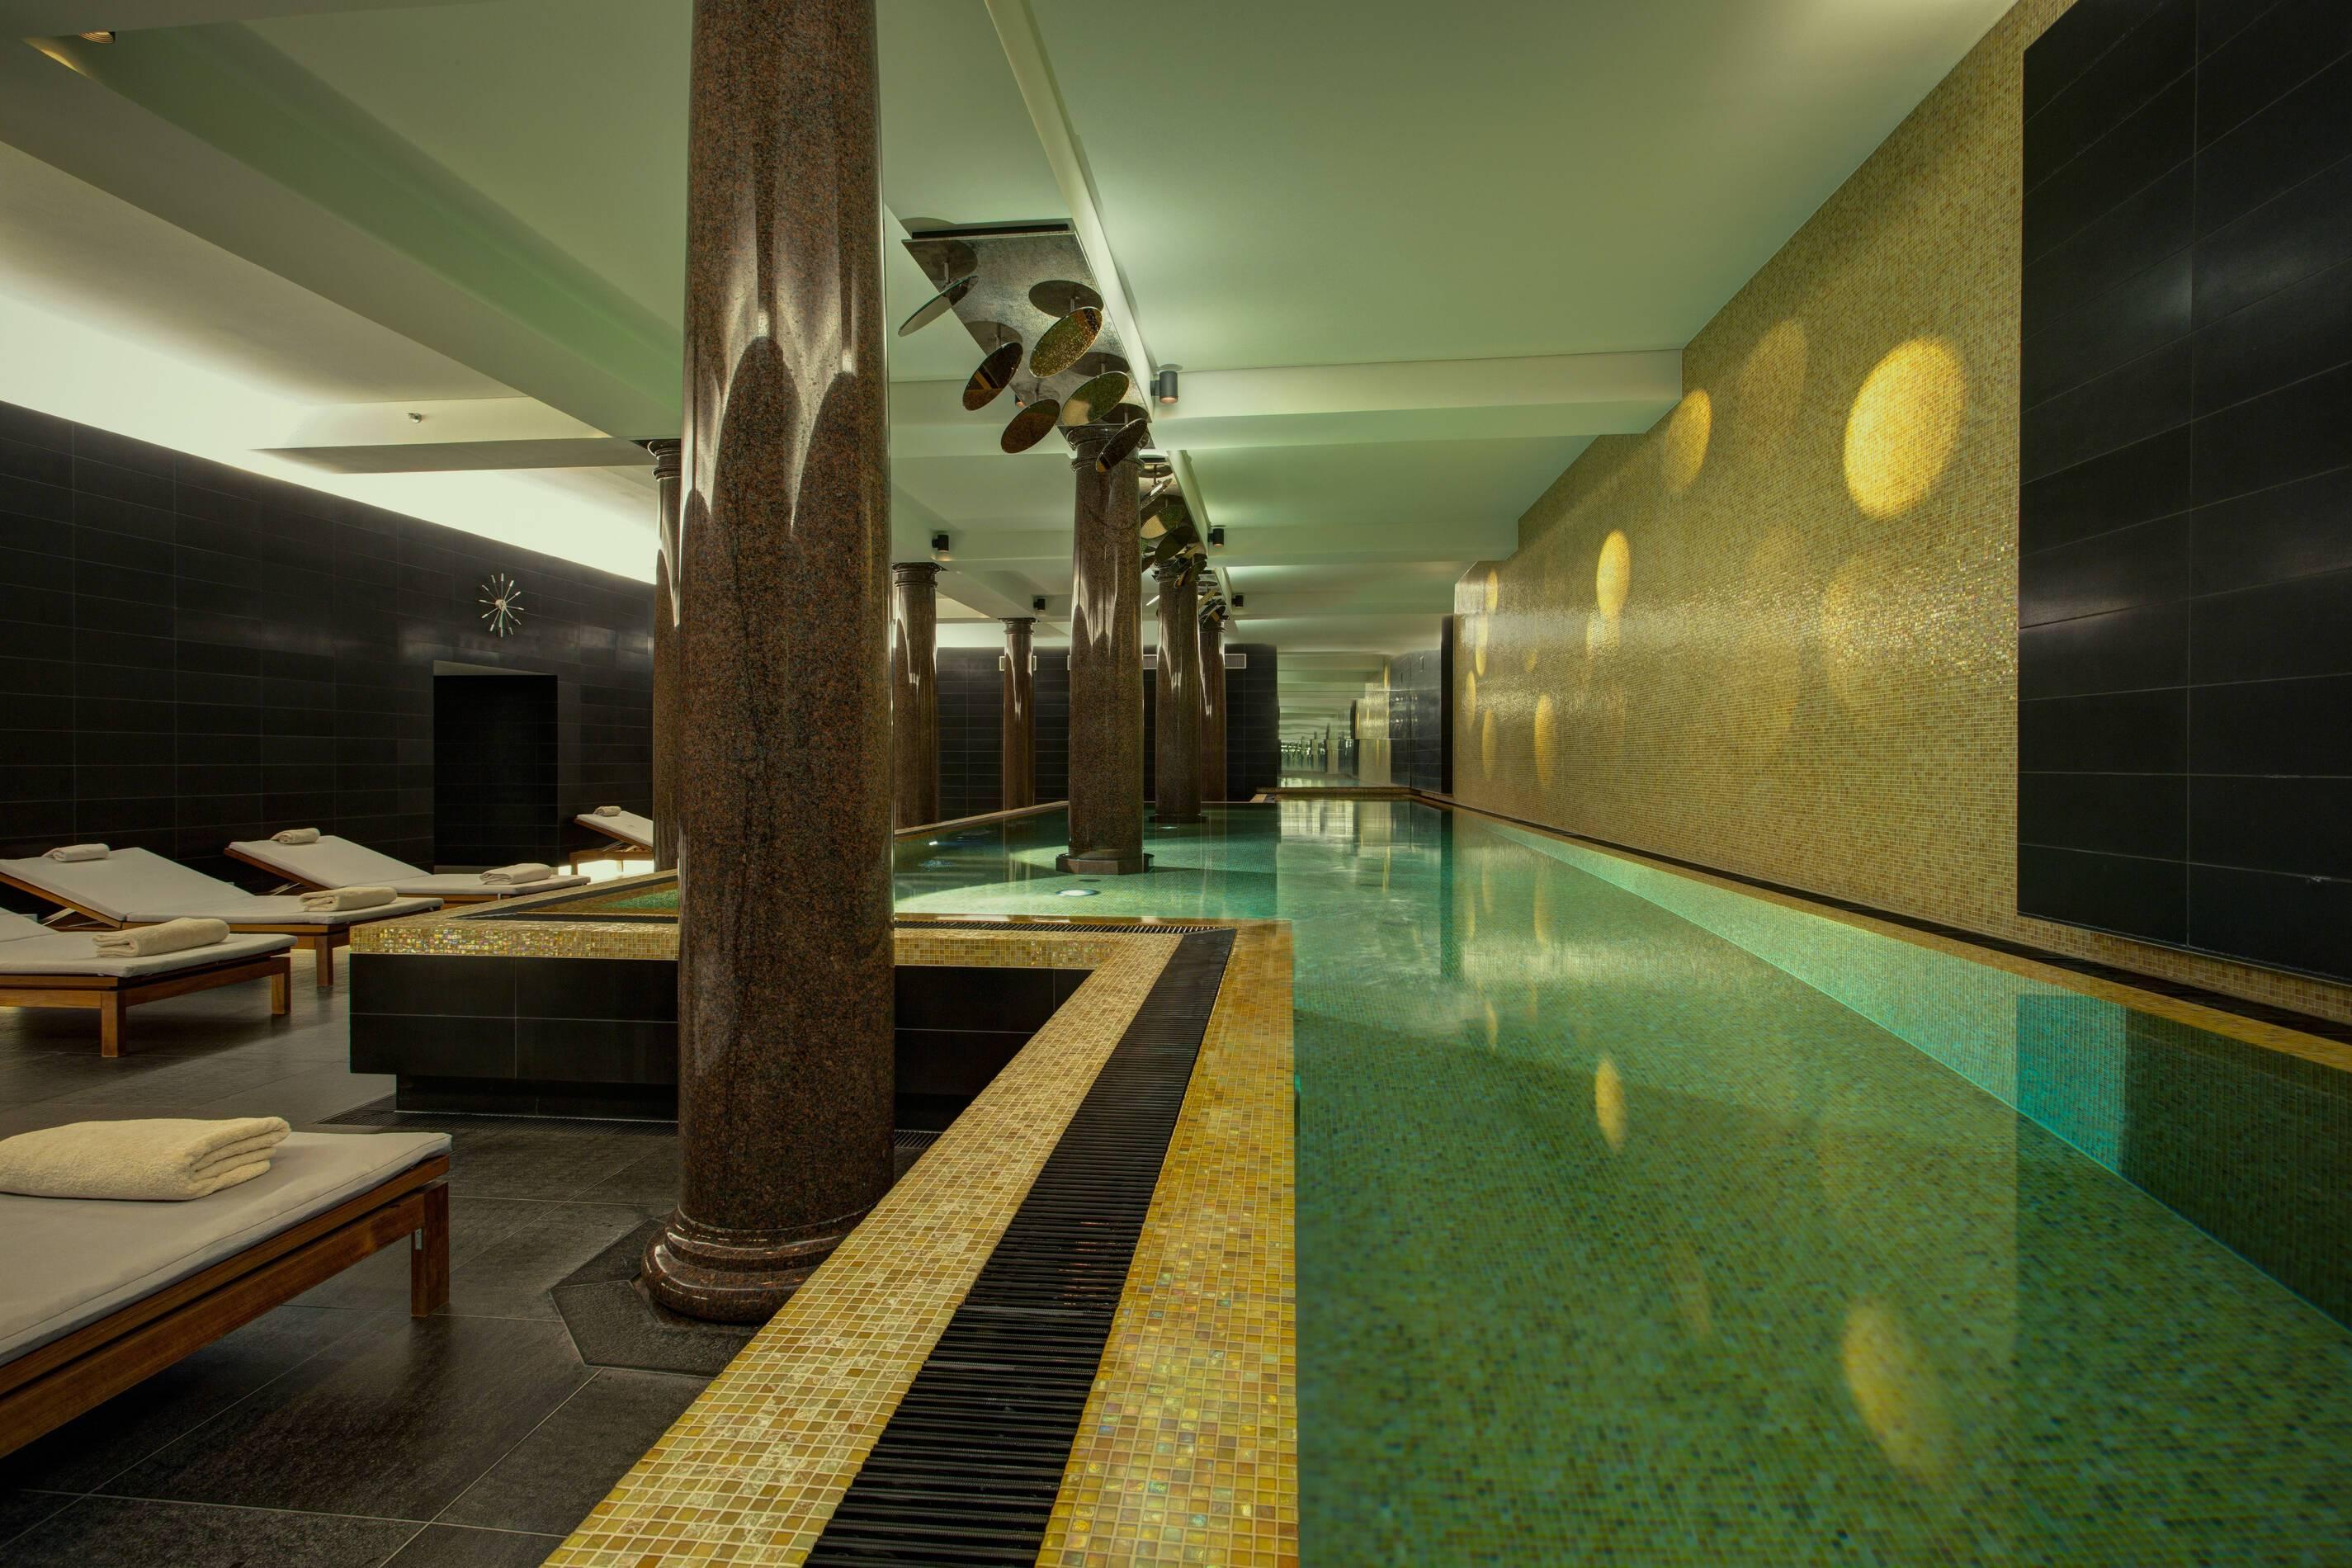 Hotel de Rome Berlin Rocco Forte Piscine